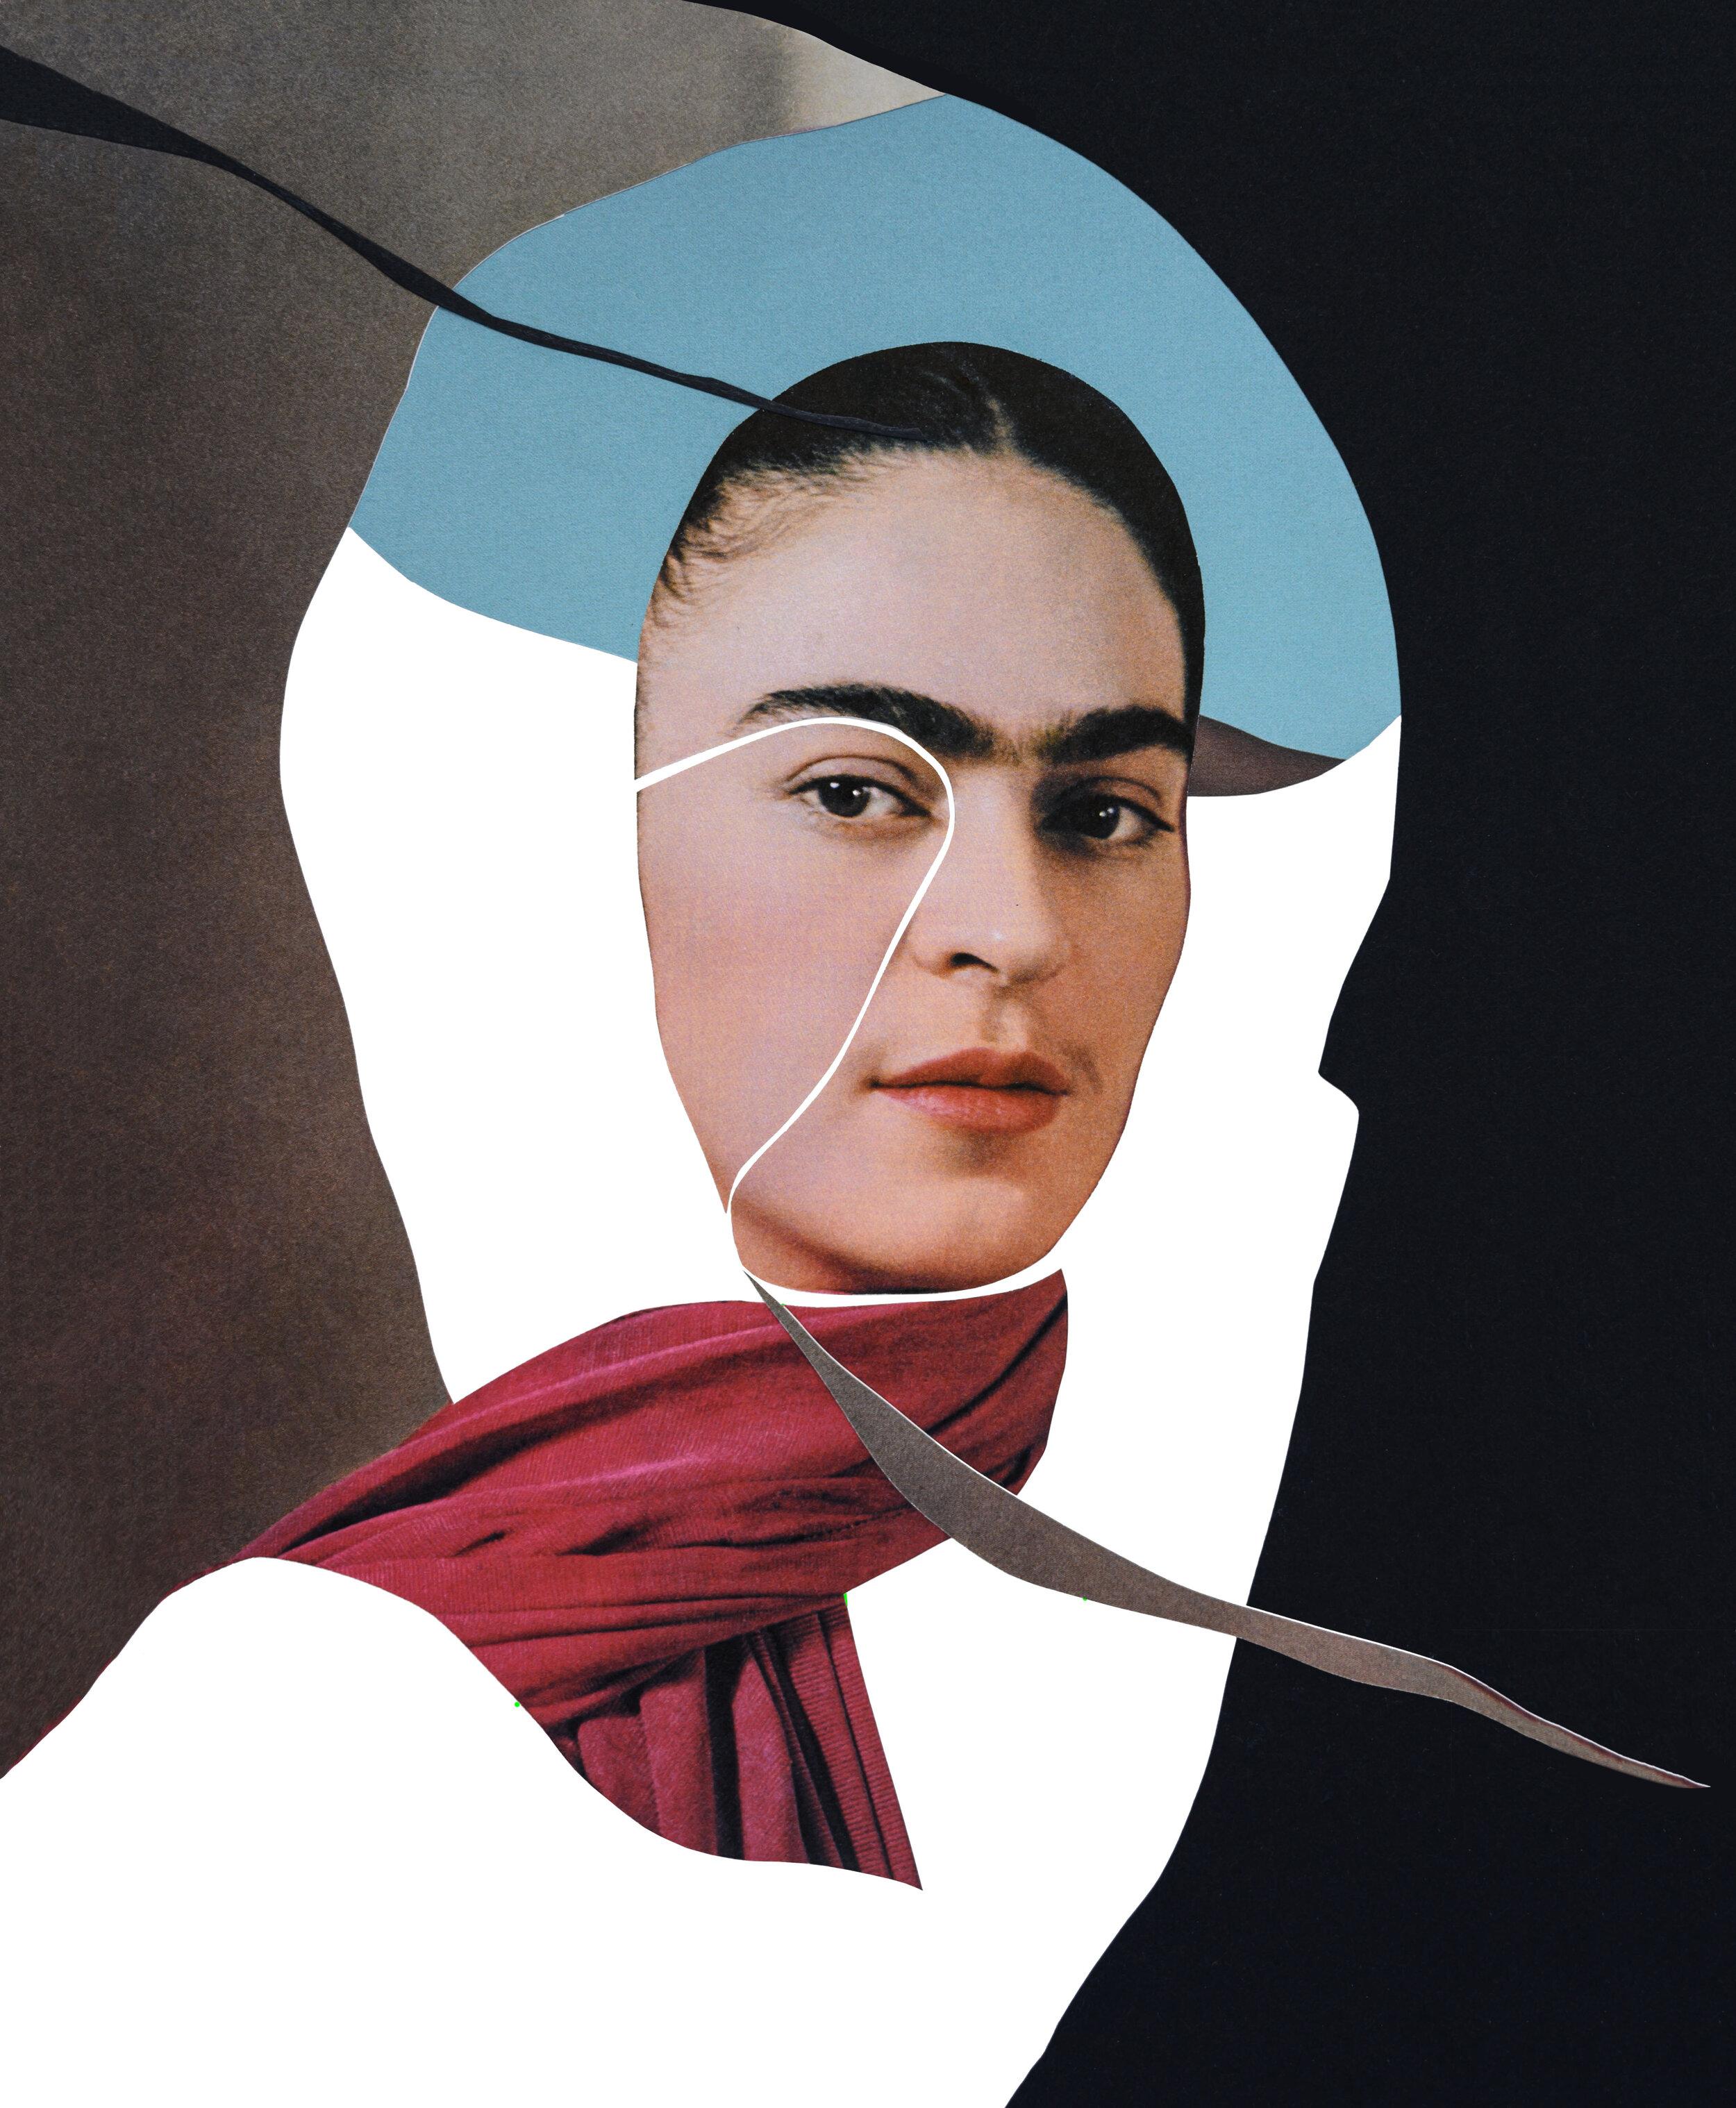 'FRIDA KAHLO' | analog  collage on 100Ib Bristol, 11 x 14 inches. 2019.